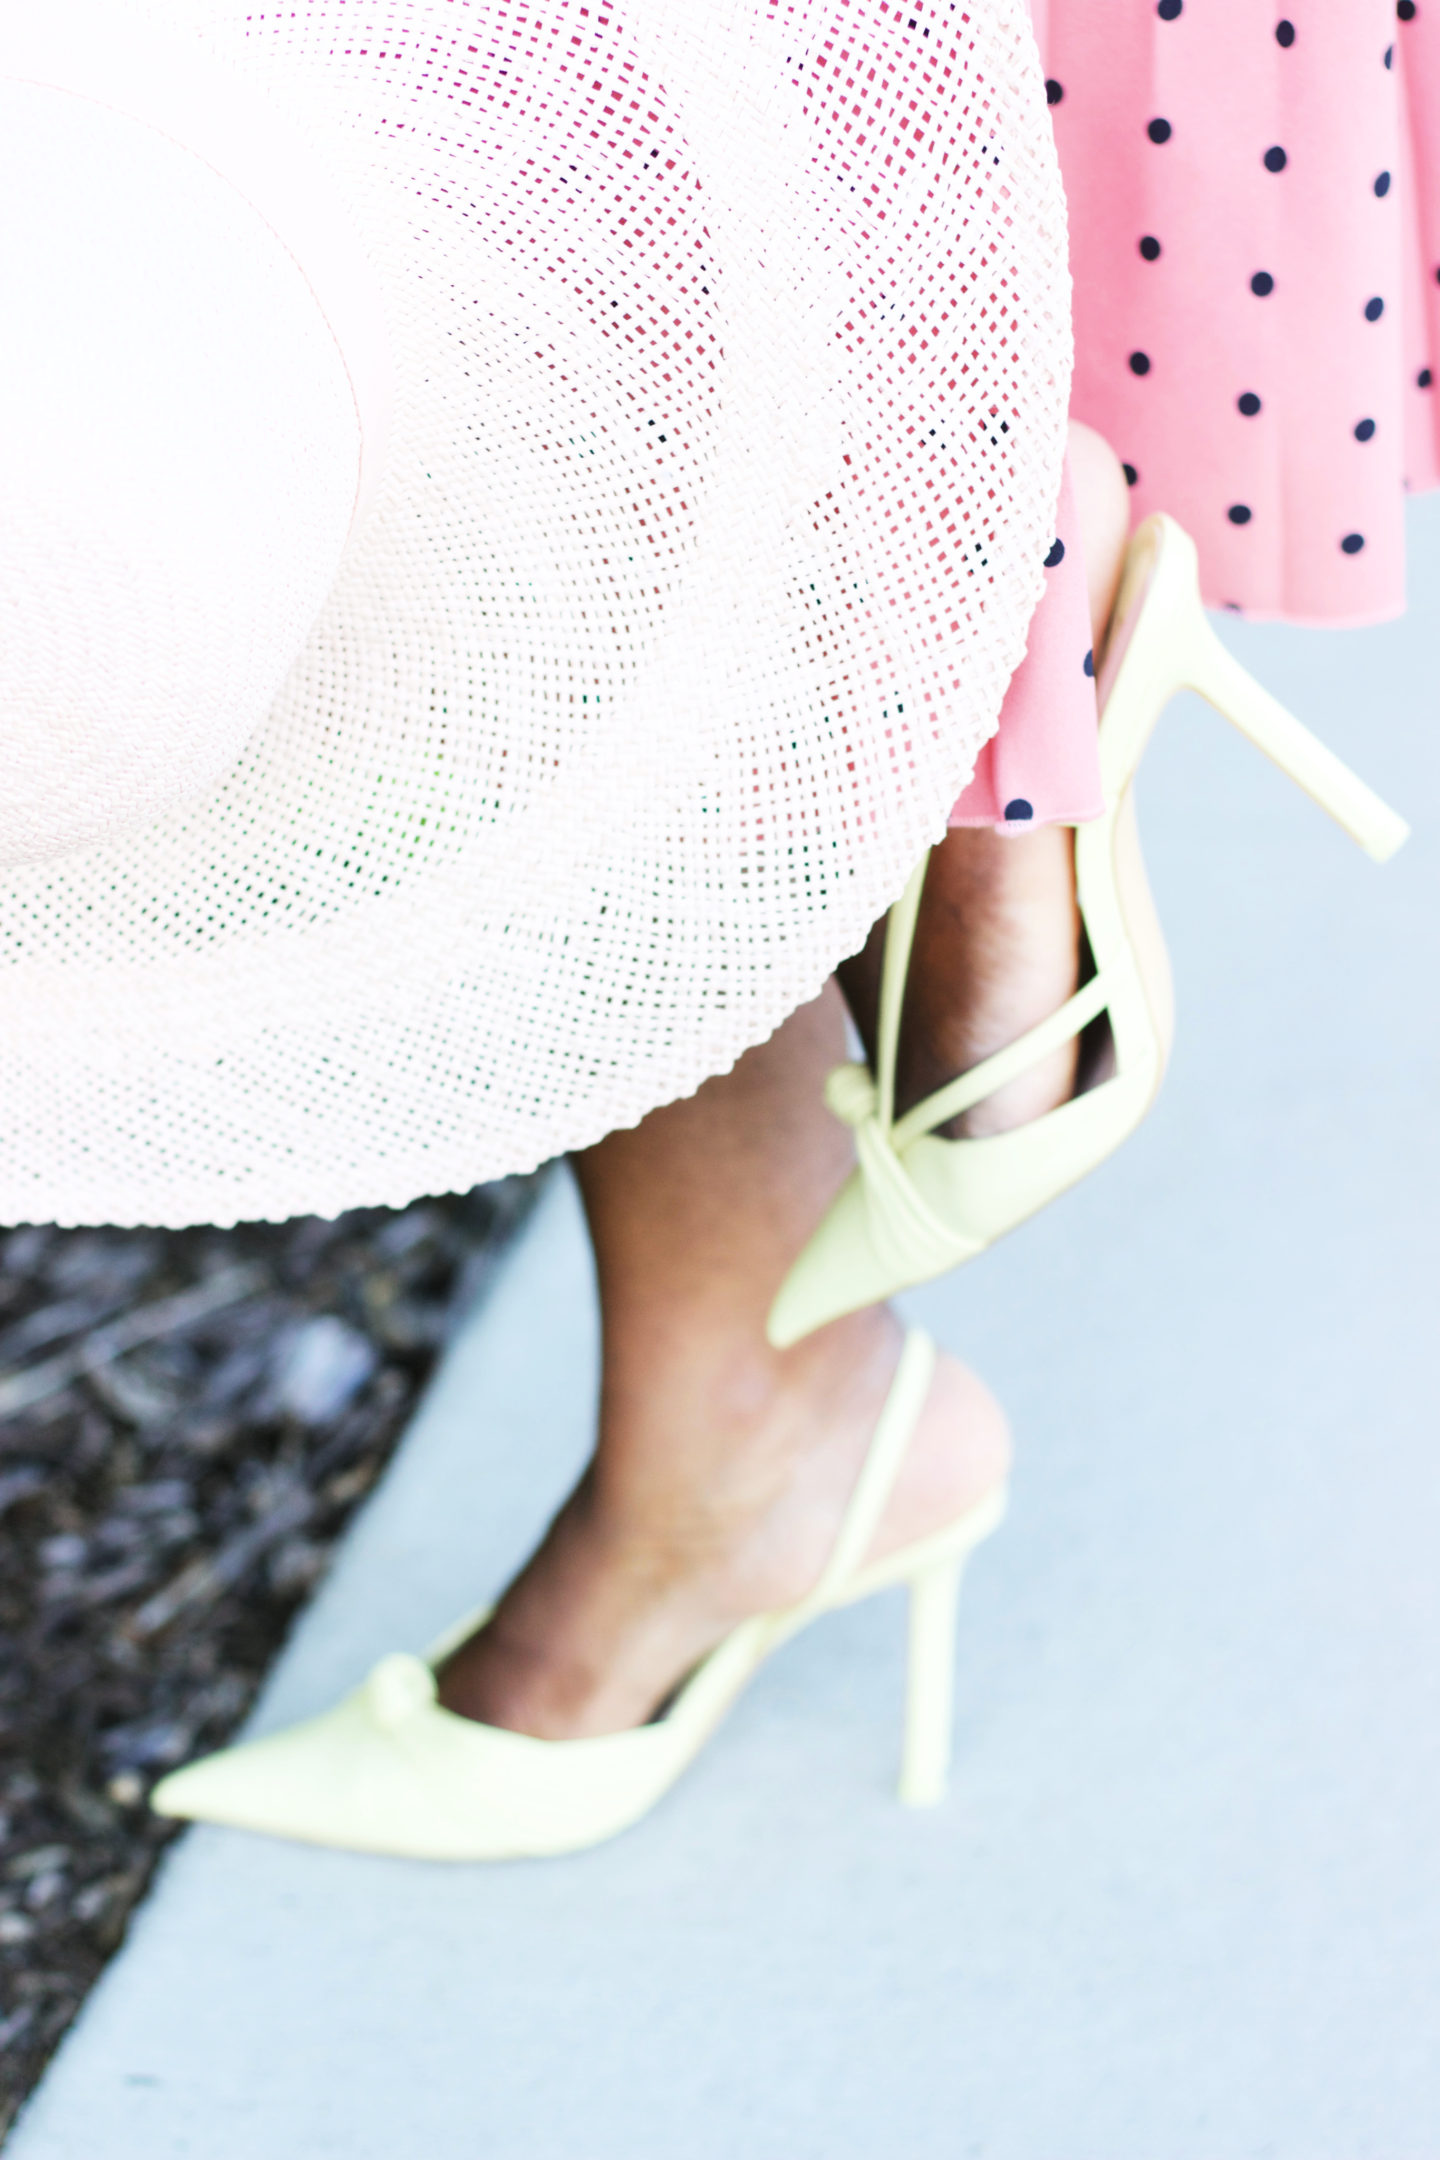 floppy-hat-cute-heels-blogger-style